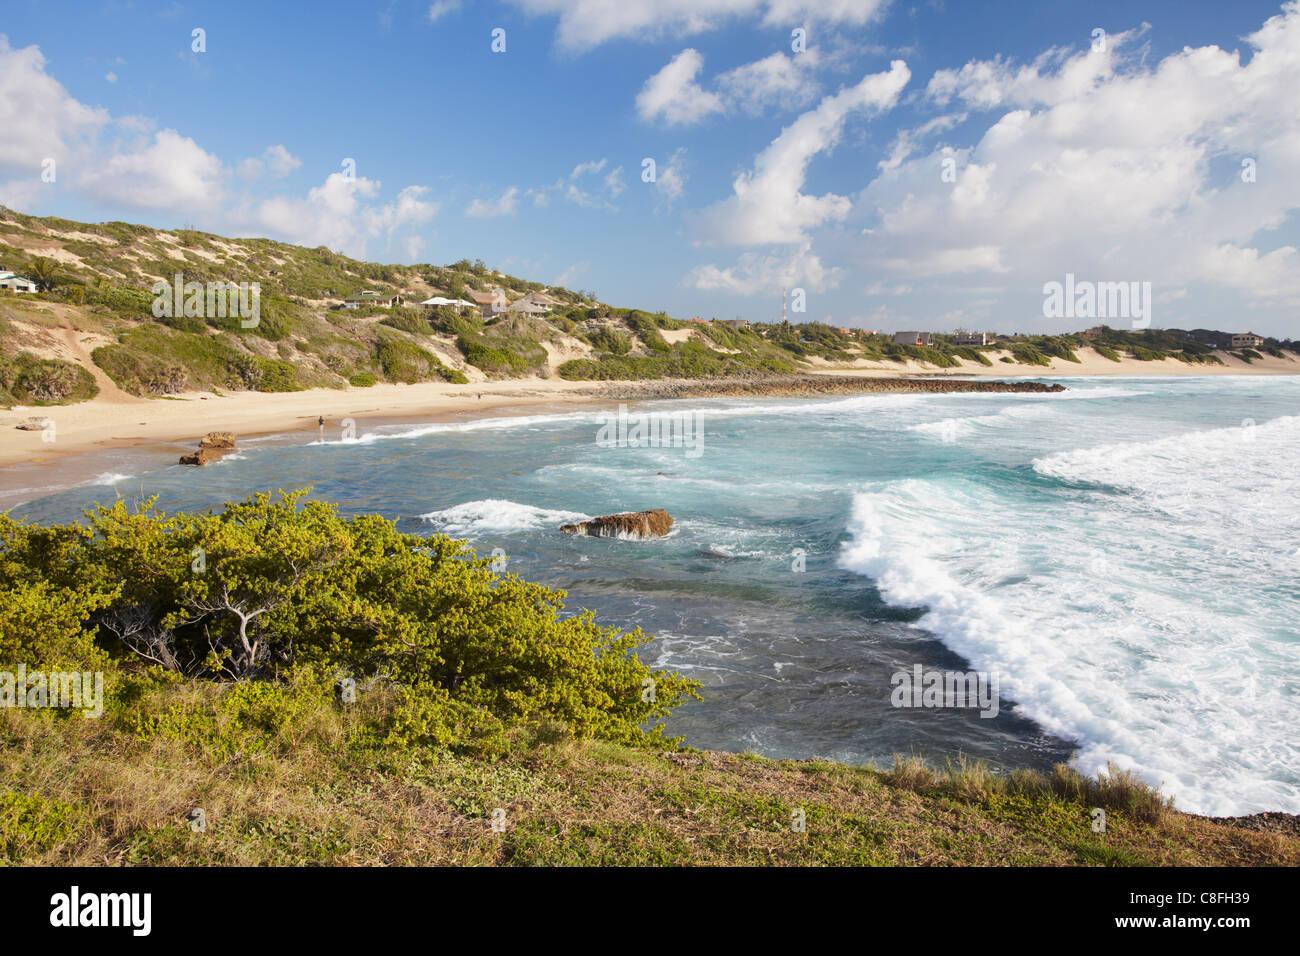 Tofo beach, Tofo, Inhambane, Mozambique - Stock Image